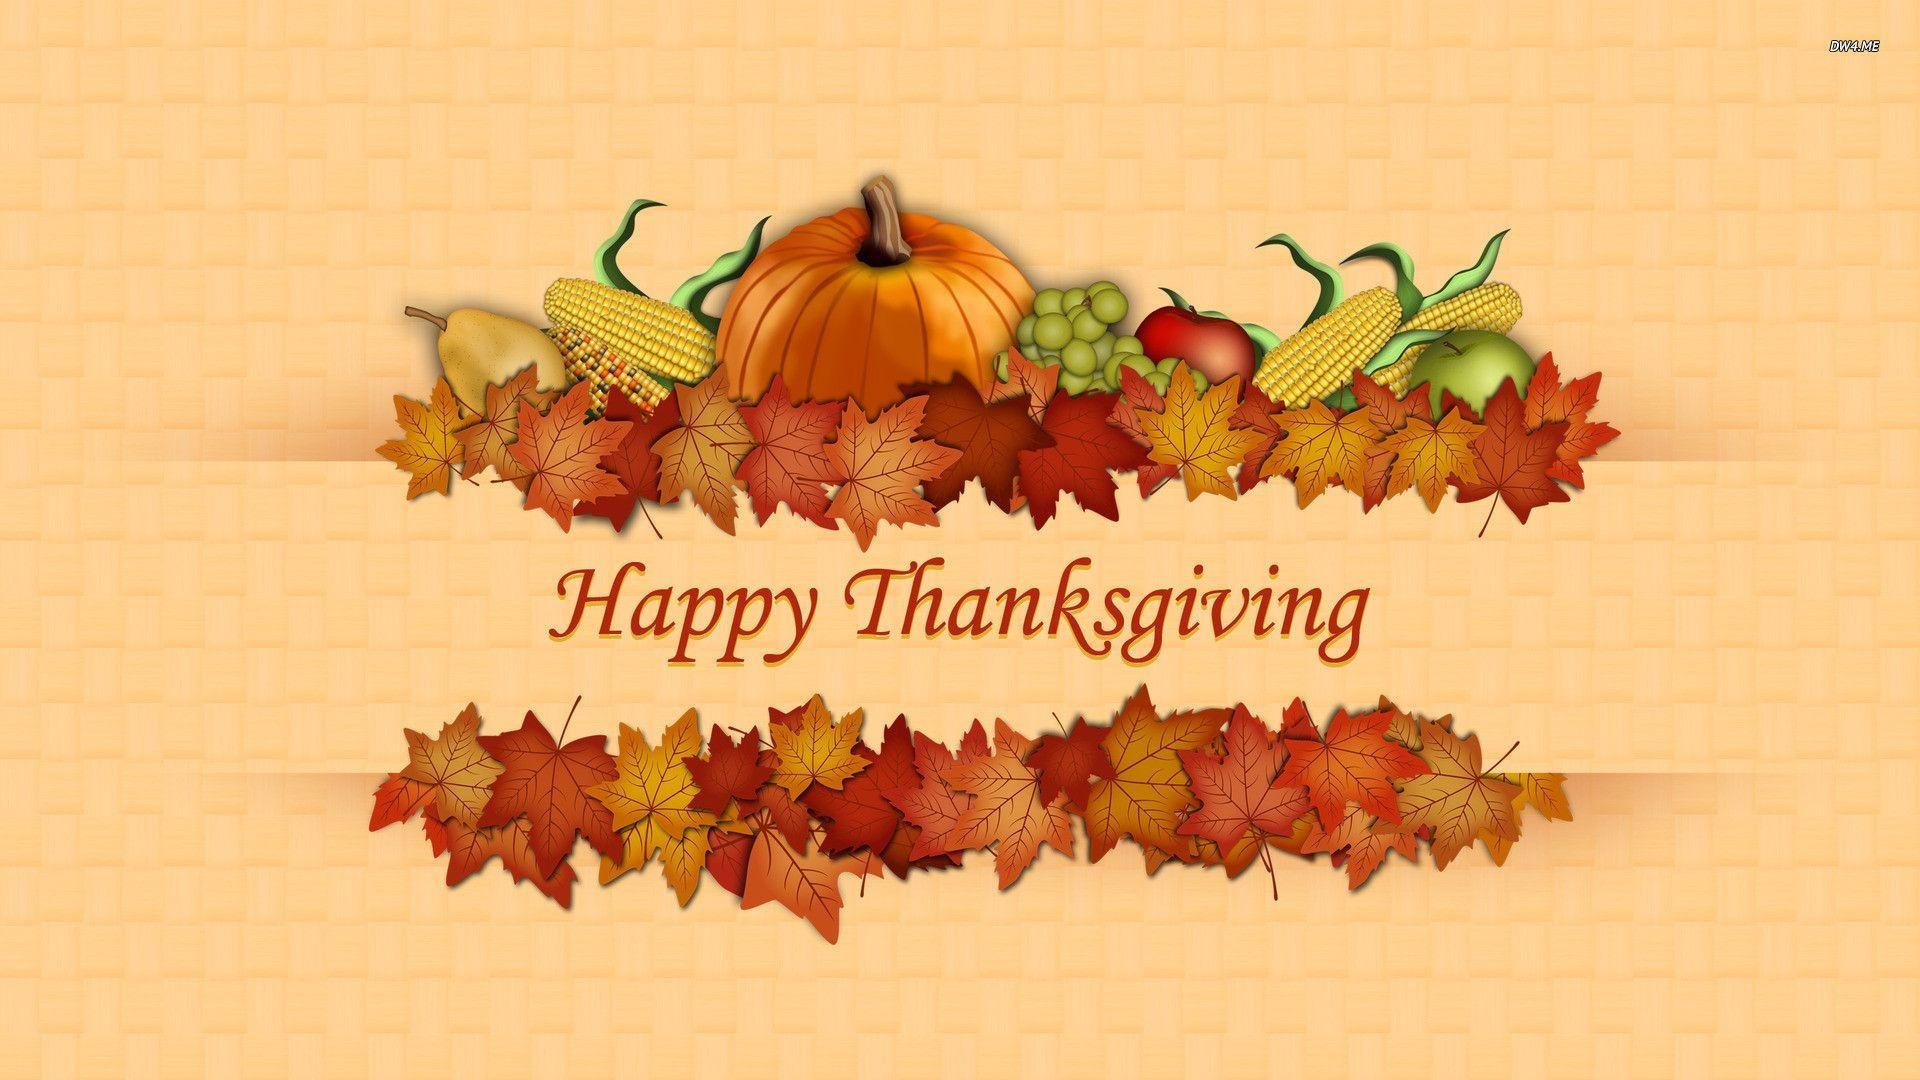 Peanuts Thanksgiving Wallpaper ·① WallpaperTag